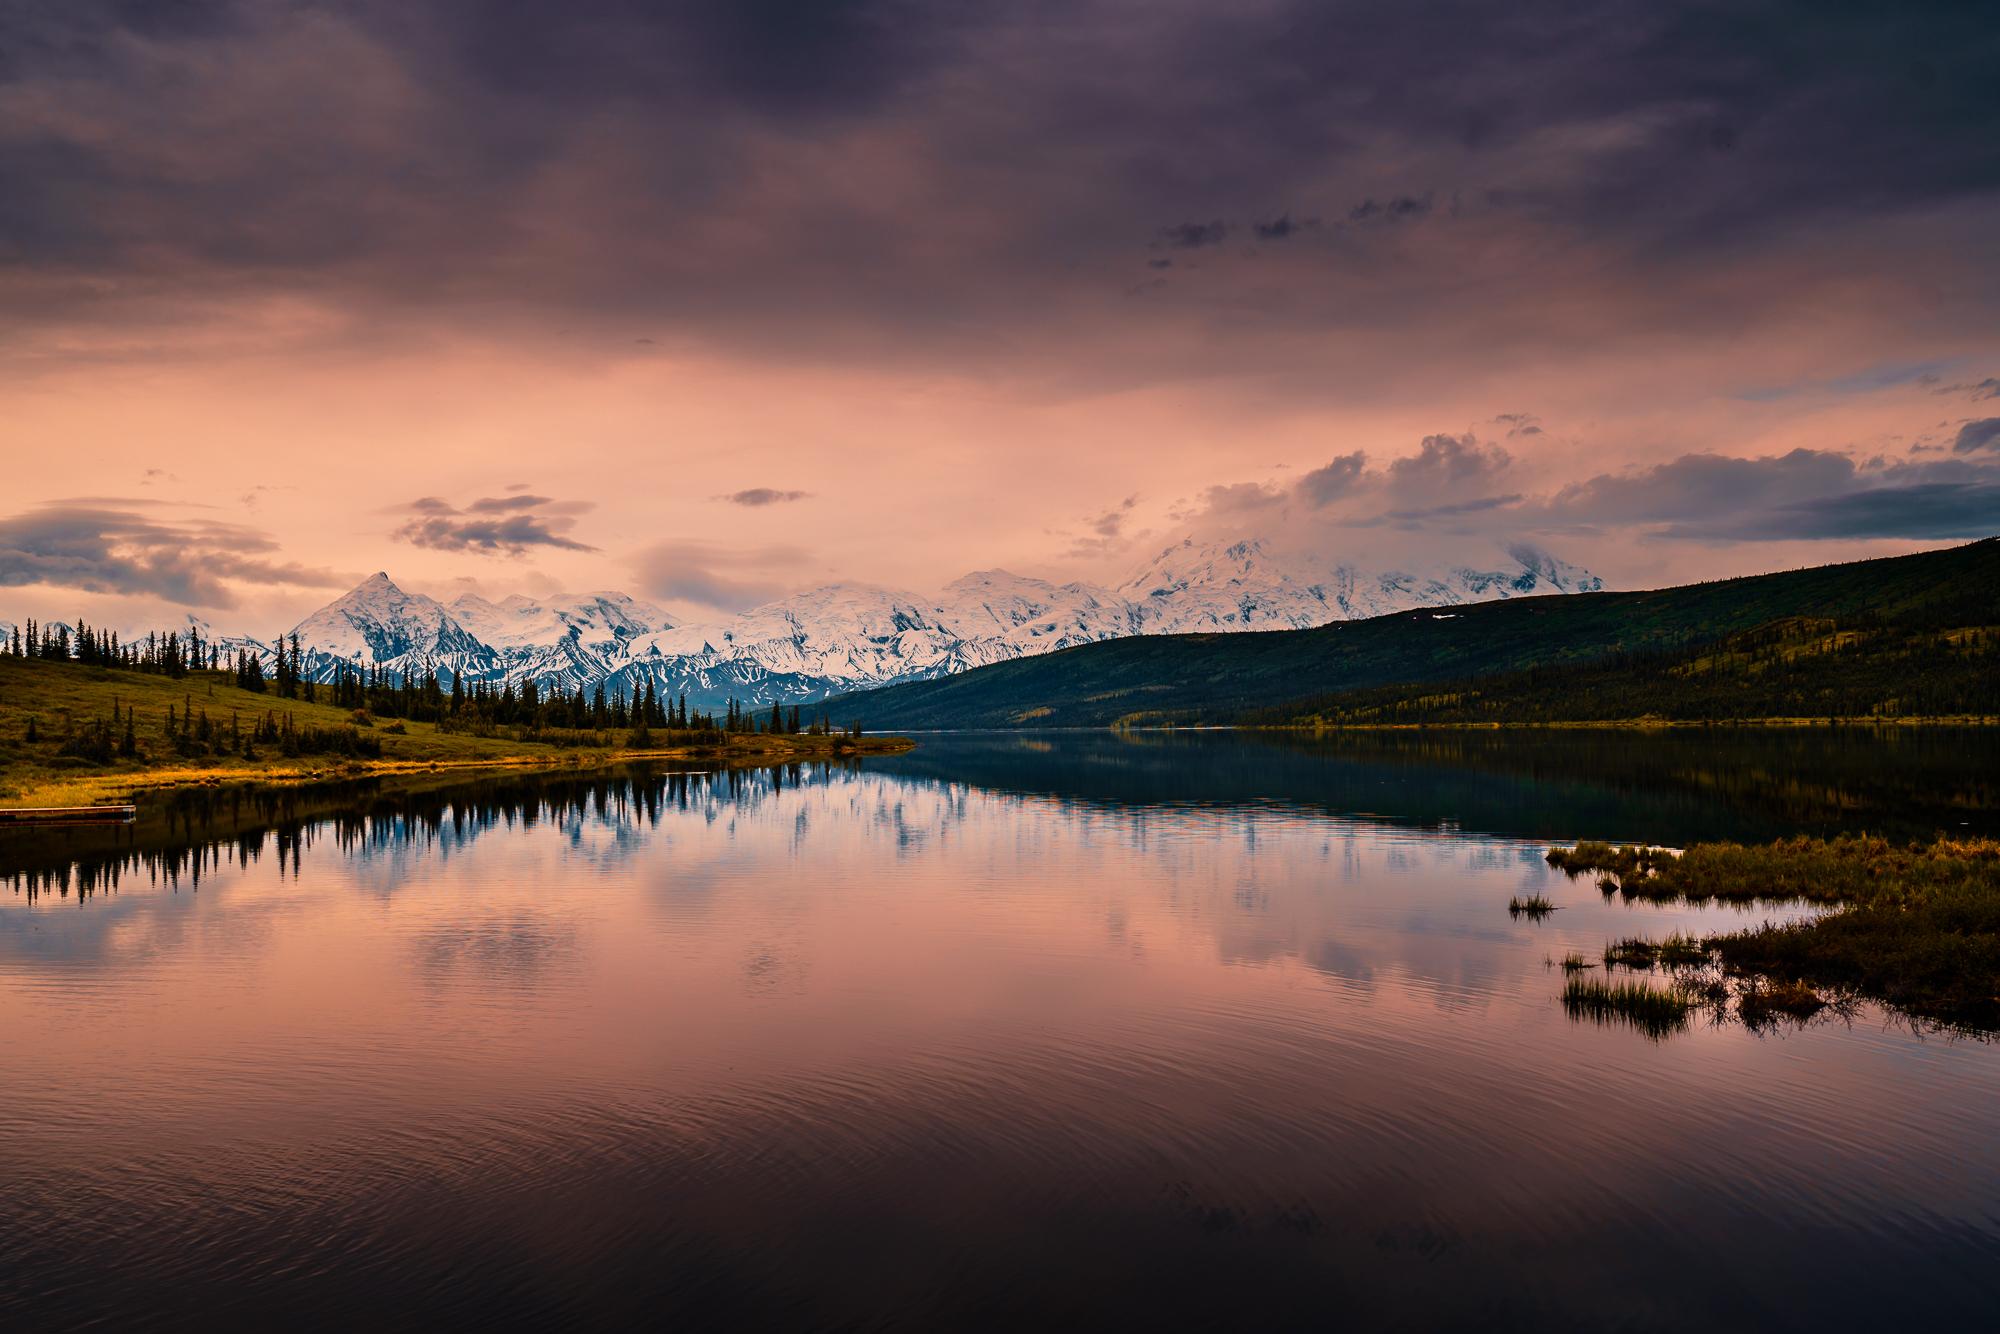 72 Stunden im Denali-Nationalpark